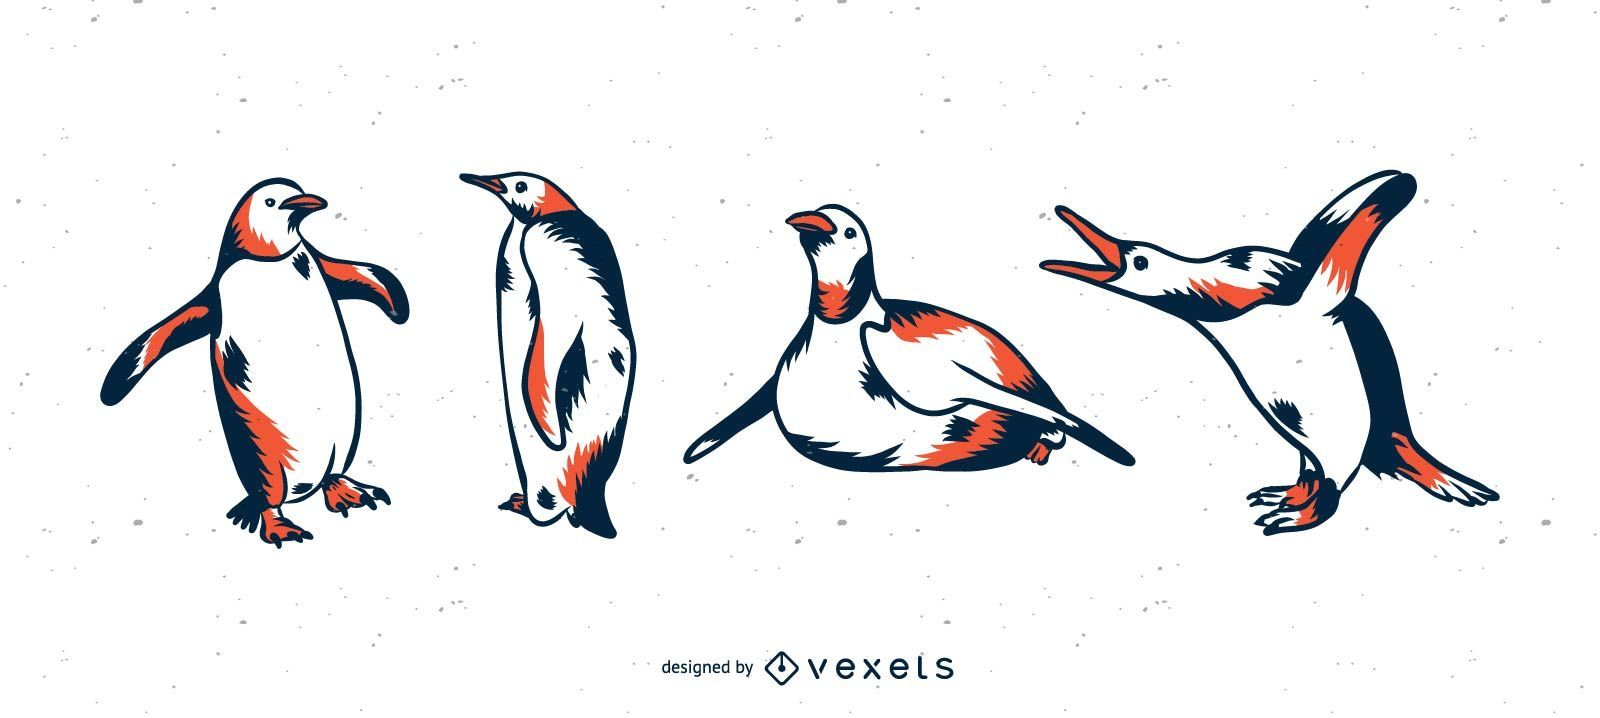 Penguin duotone illustration set